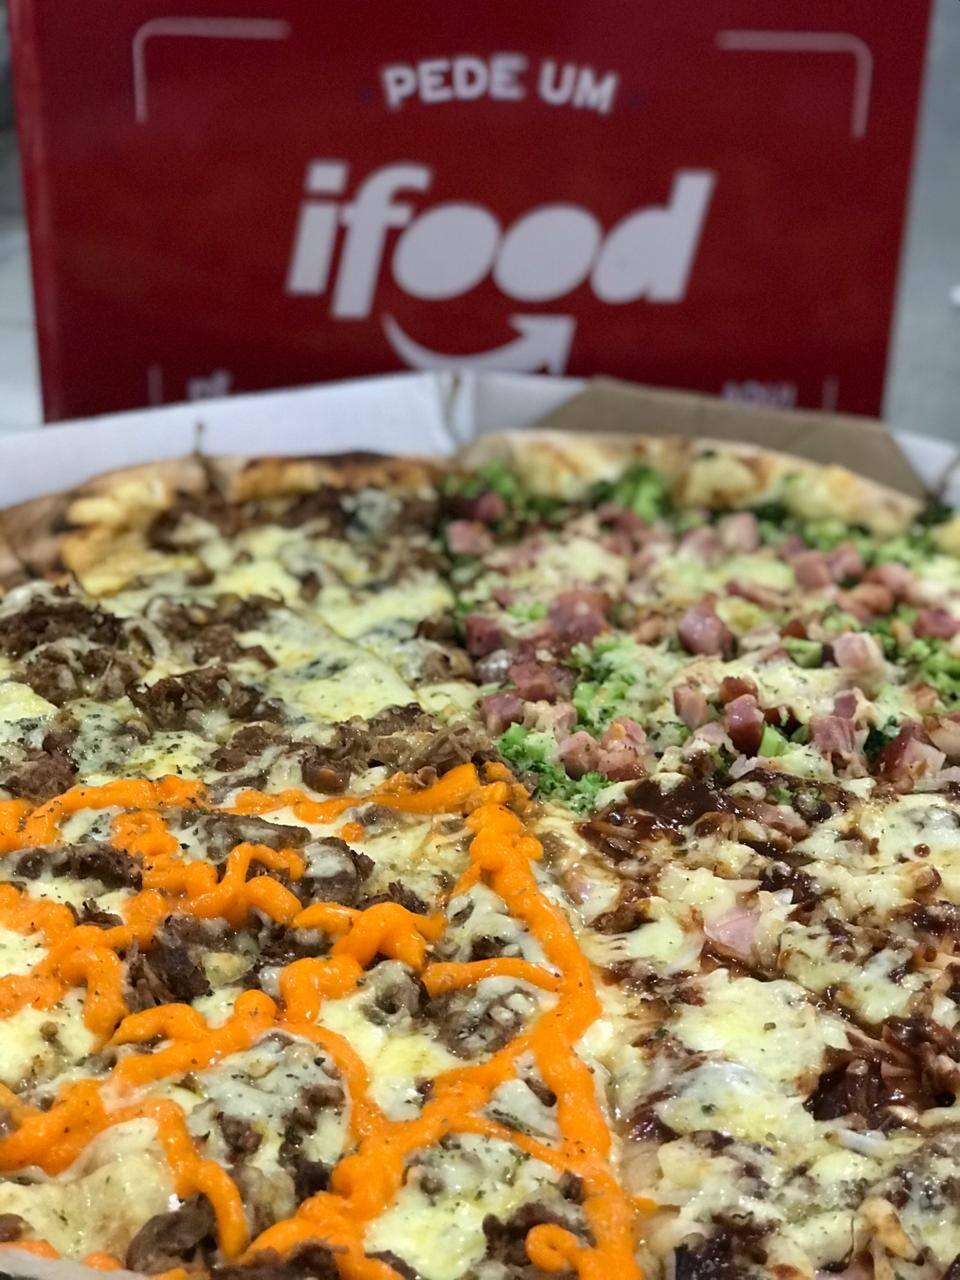 Palácio das Pizzas